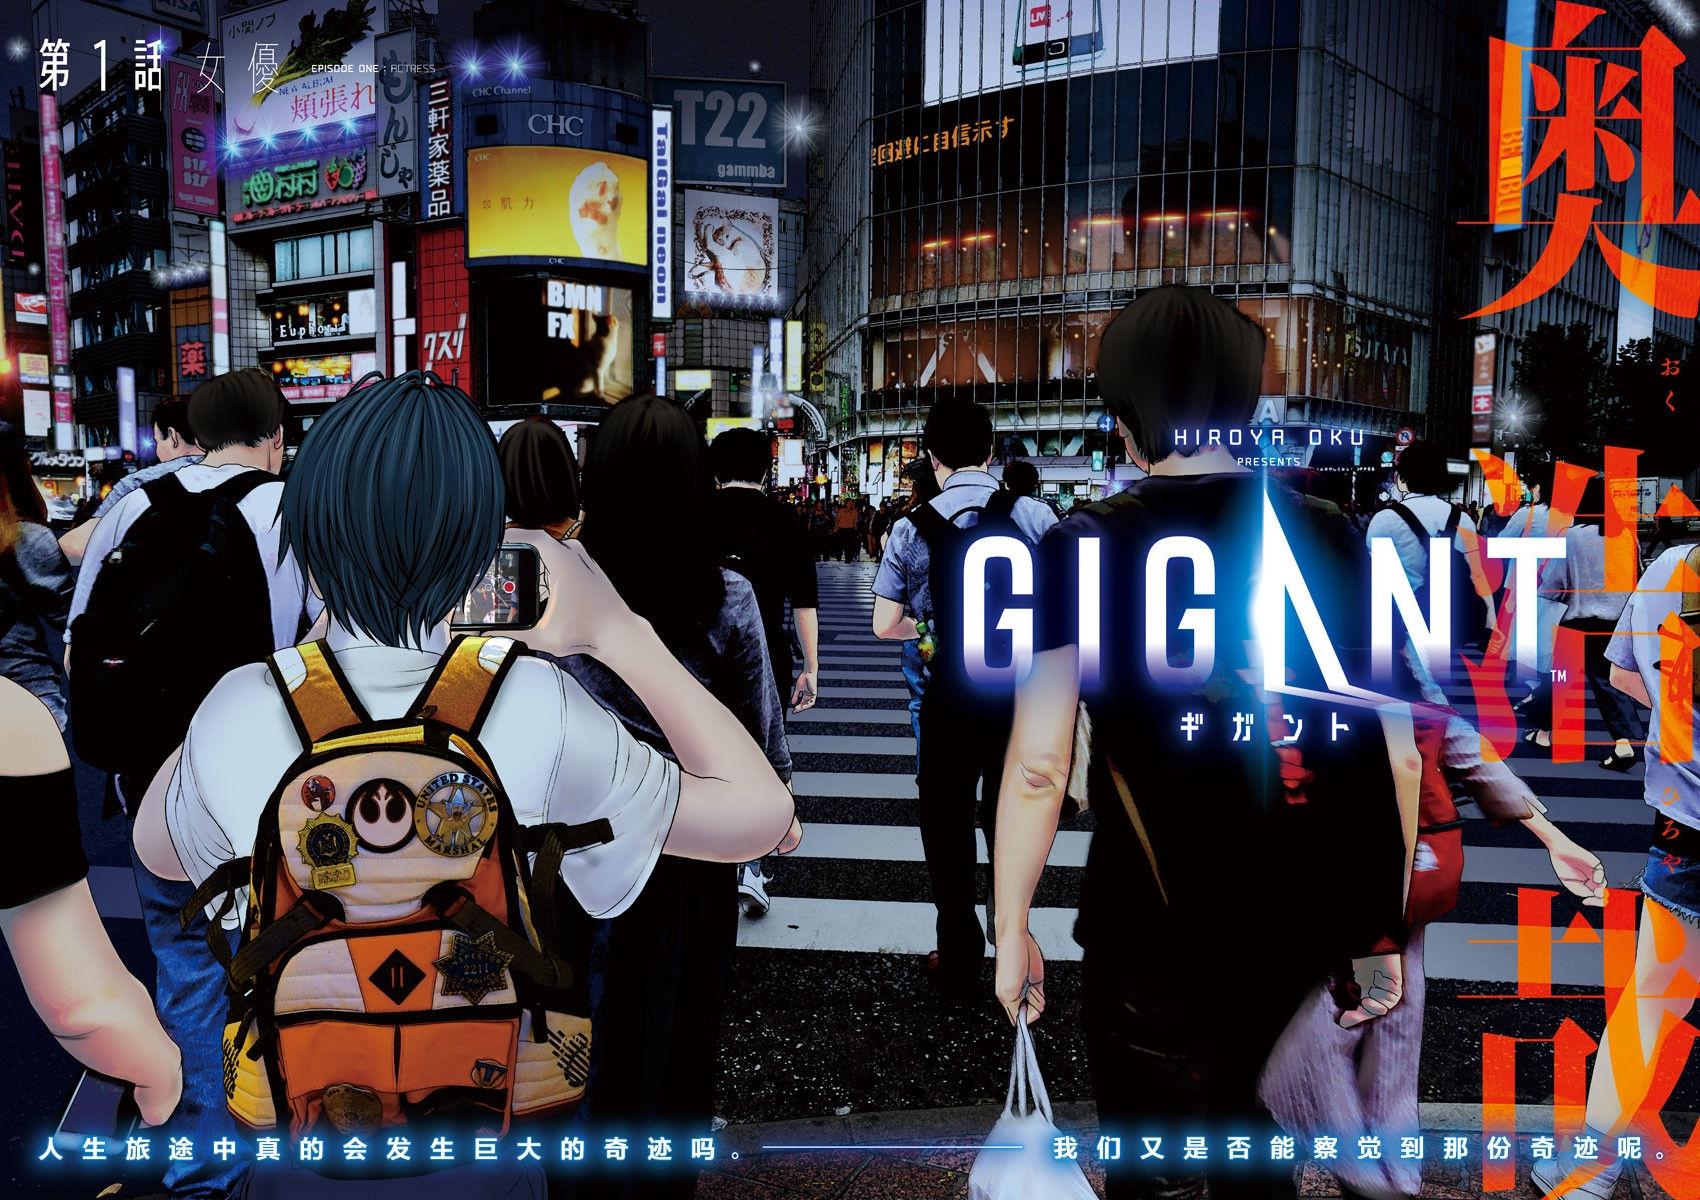 GIGANT - Raw Chapter 1 - Lhscans.com